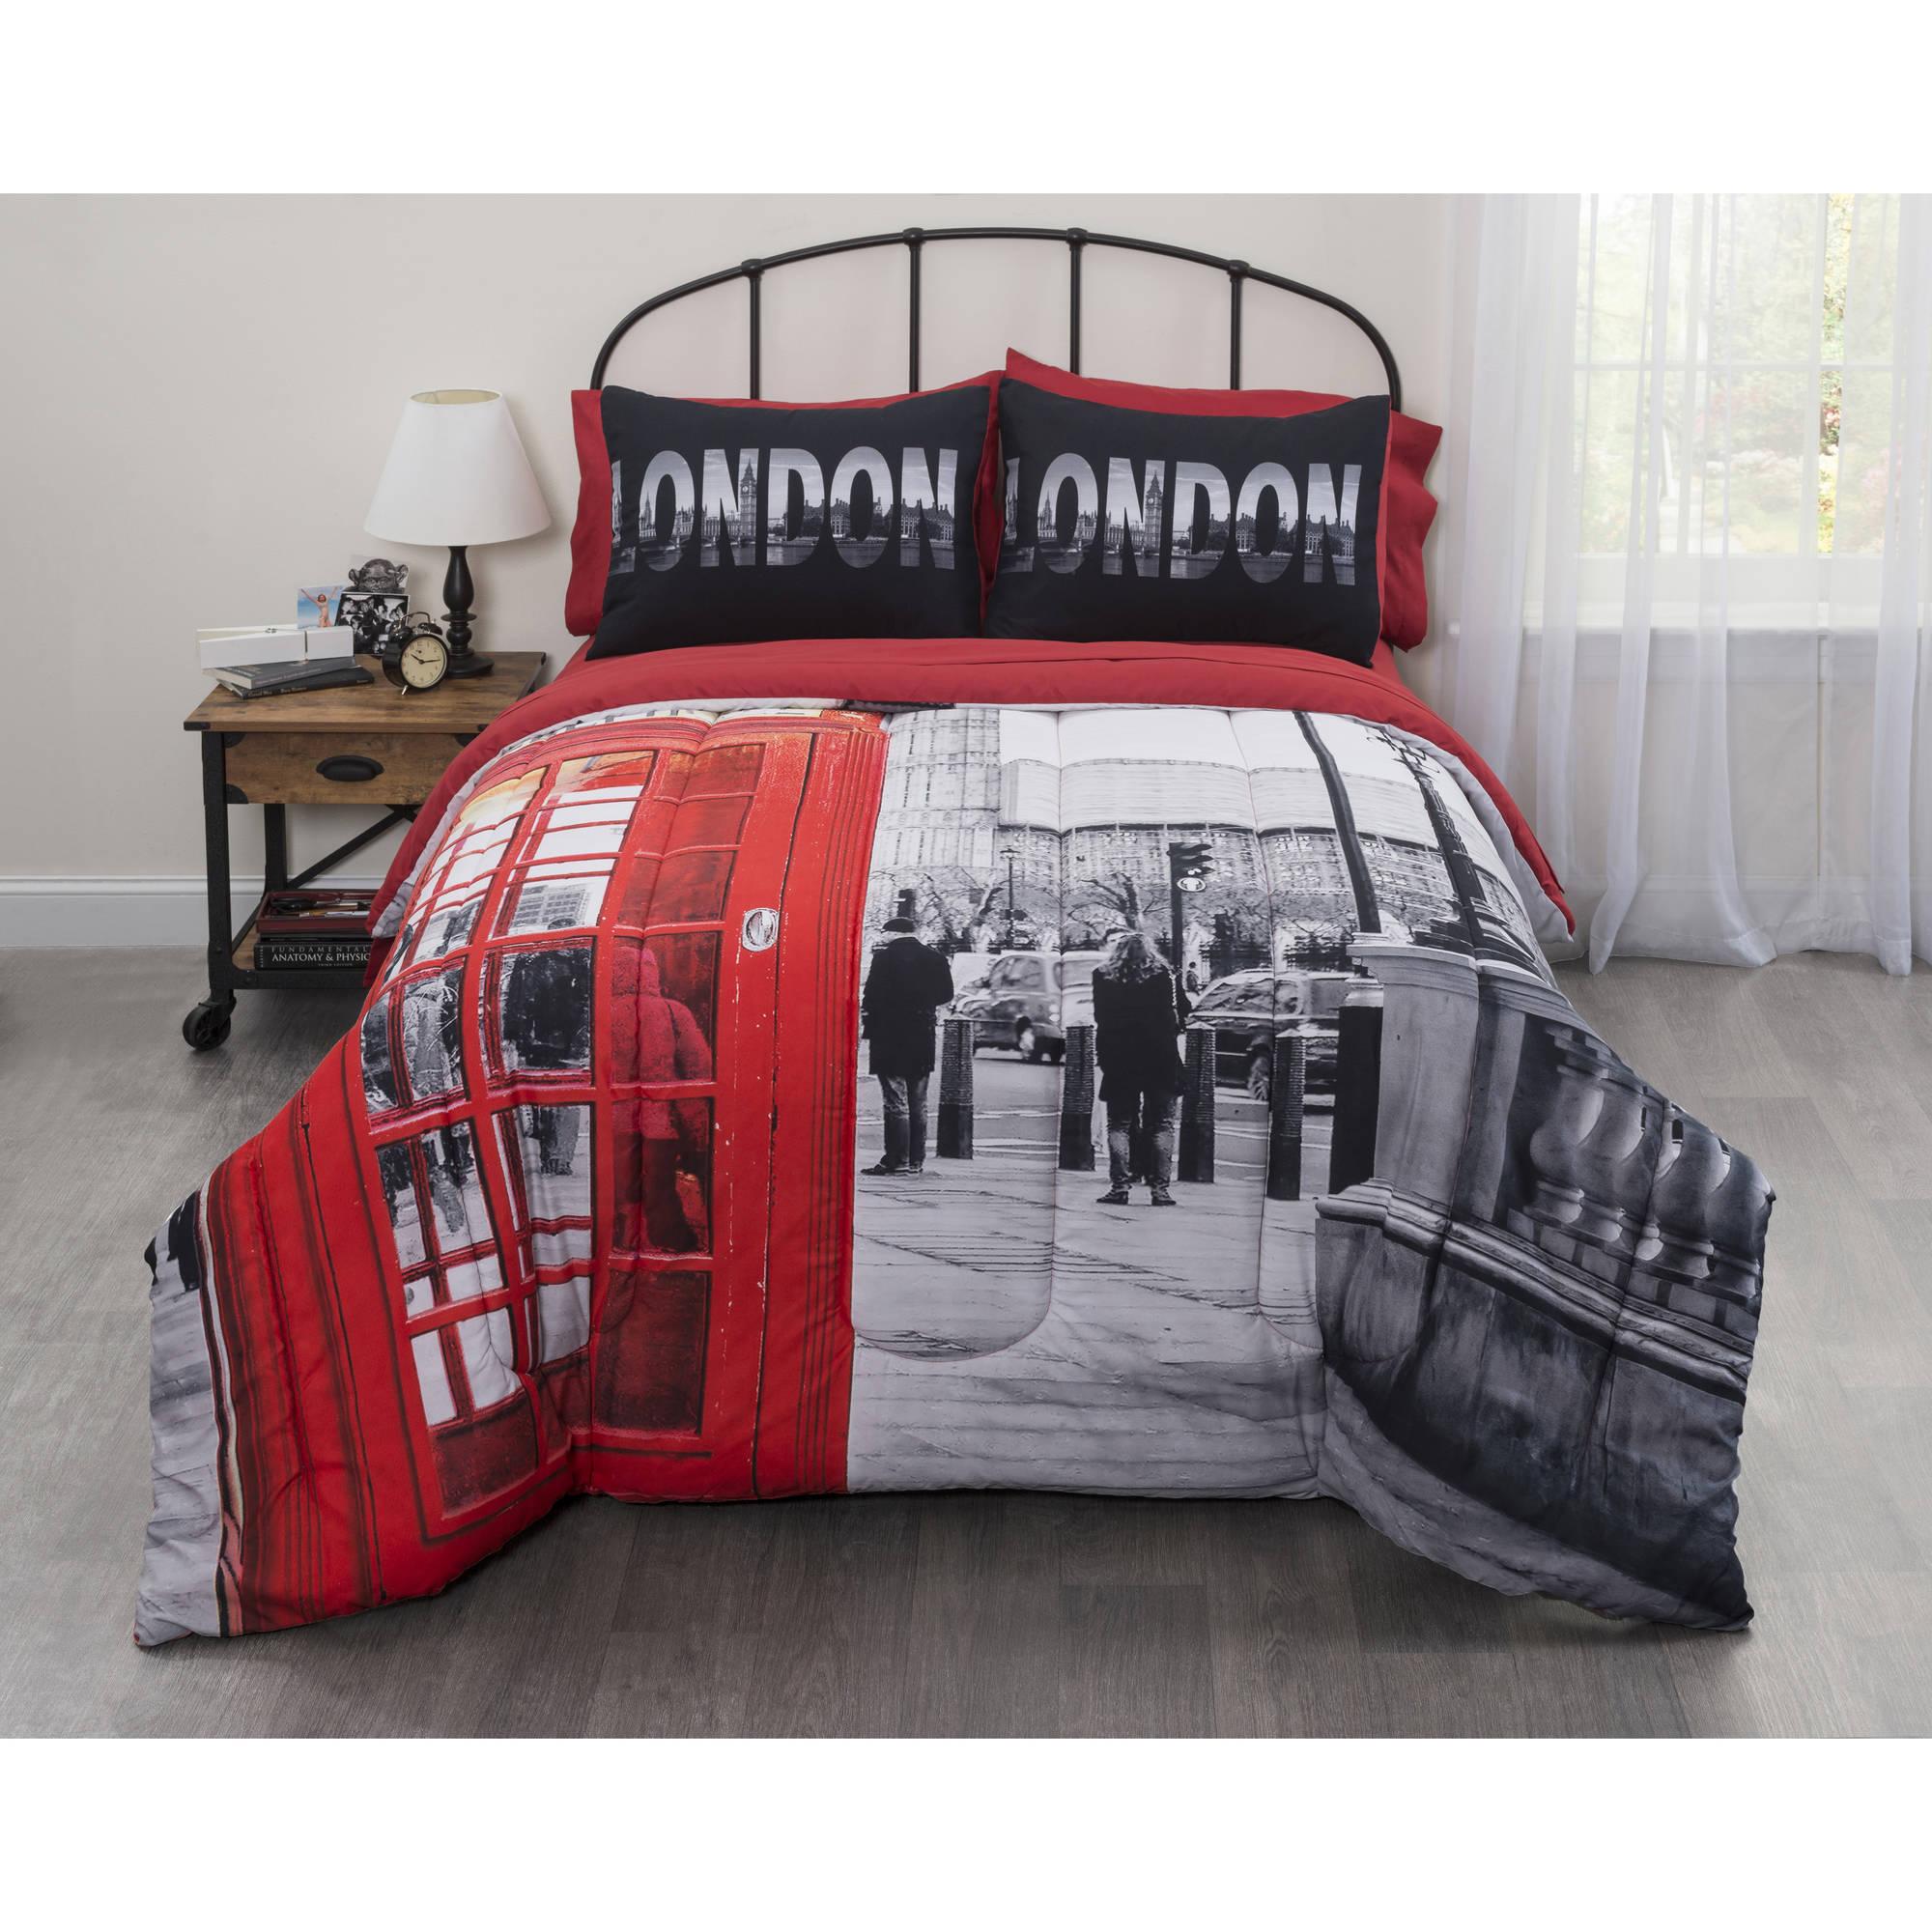 Big Ben Photobooth London Bed-In-A-Bag Comforter Set